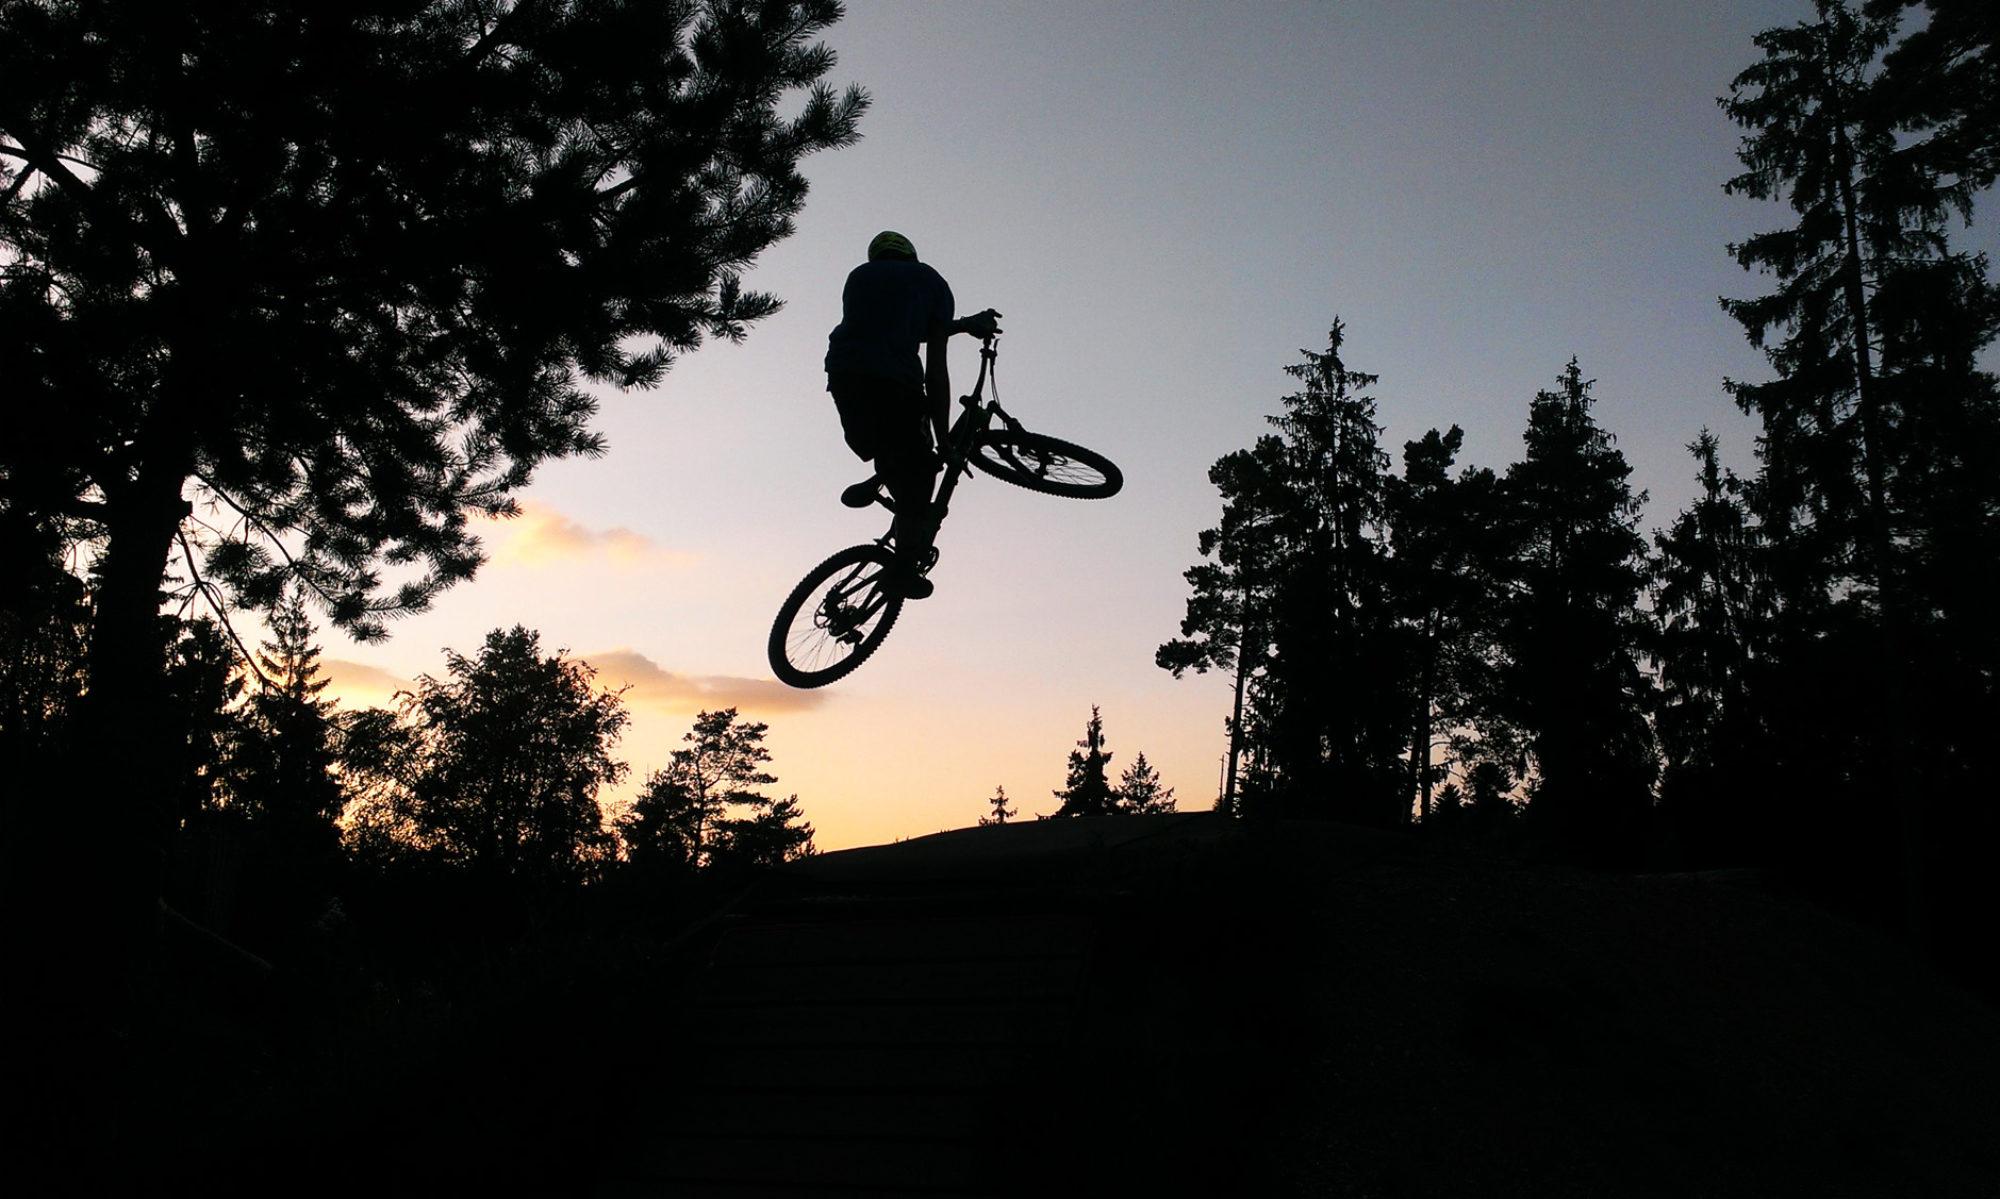 fahrvergnügen e.V. - Mountainbiken in Trier